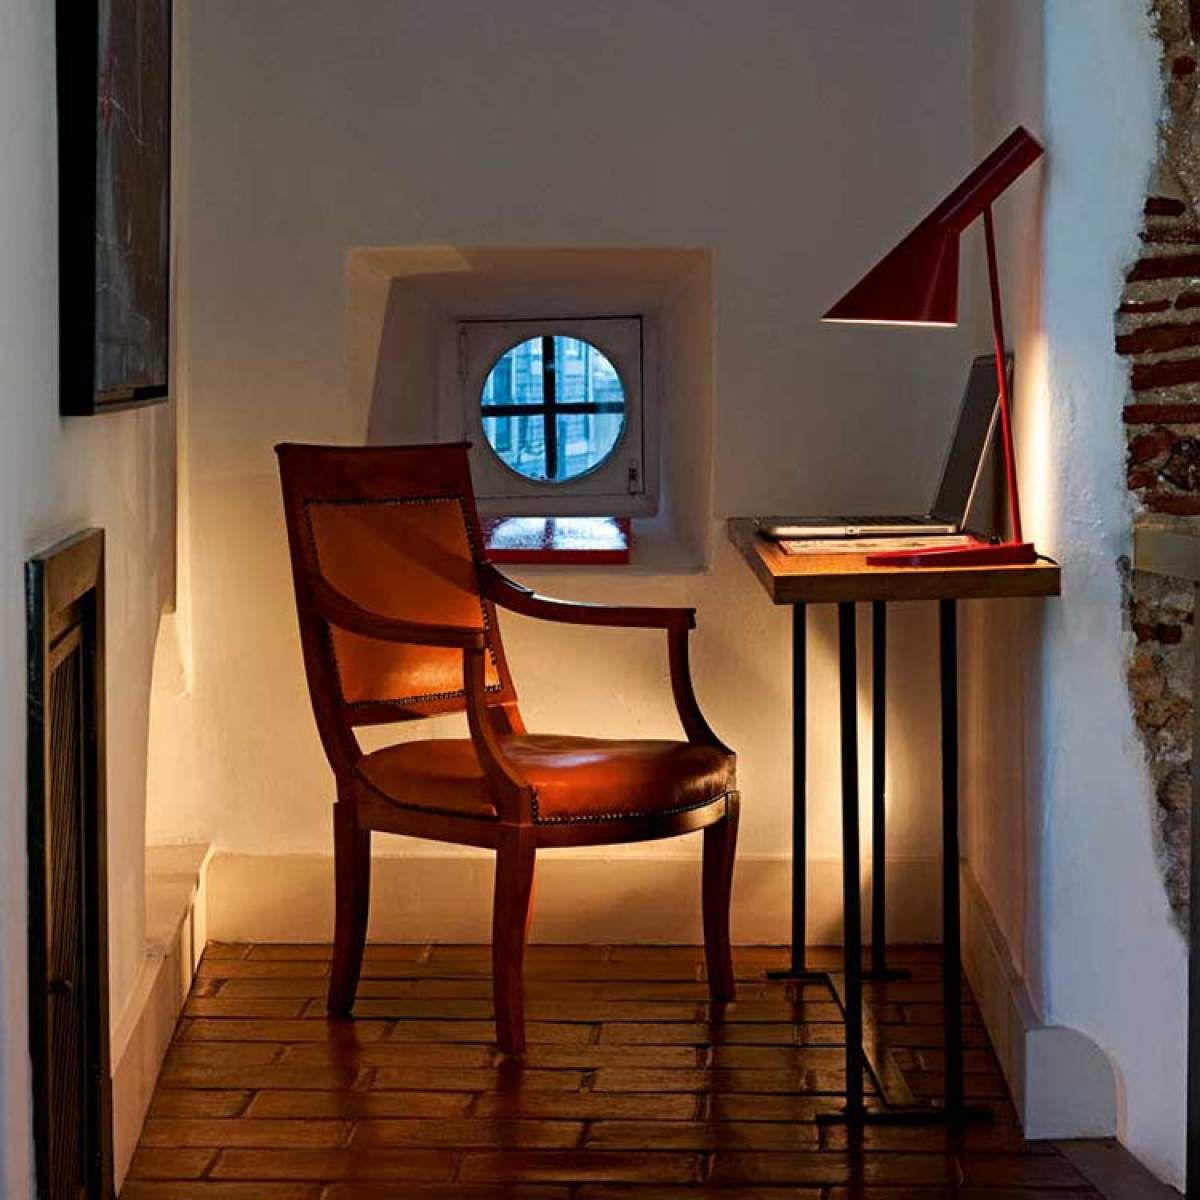 louis poulsen aj lampe poser design rouillelampe. Black Bedroom Furniture Sets. Home Design Ideas